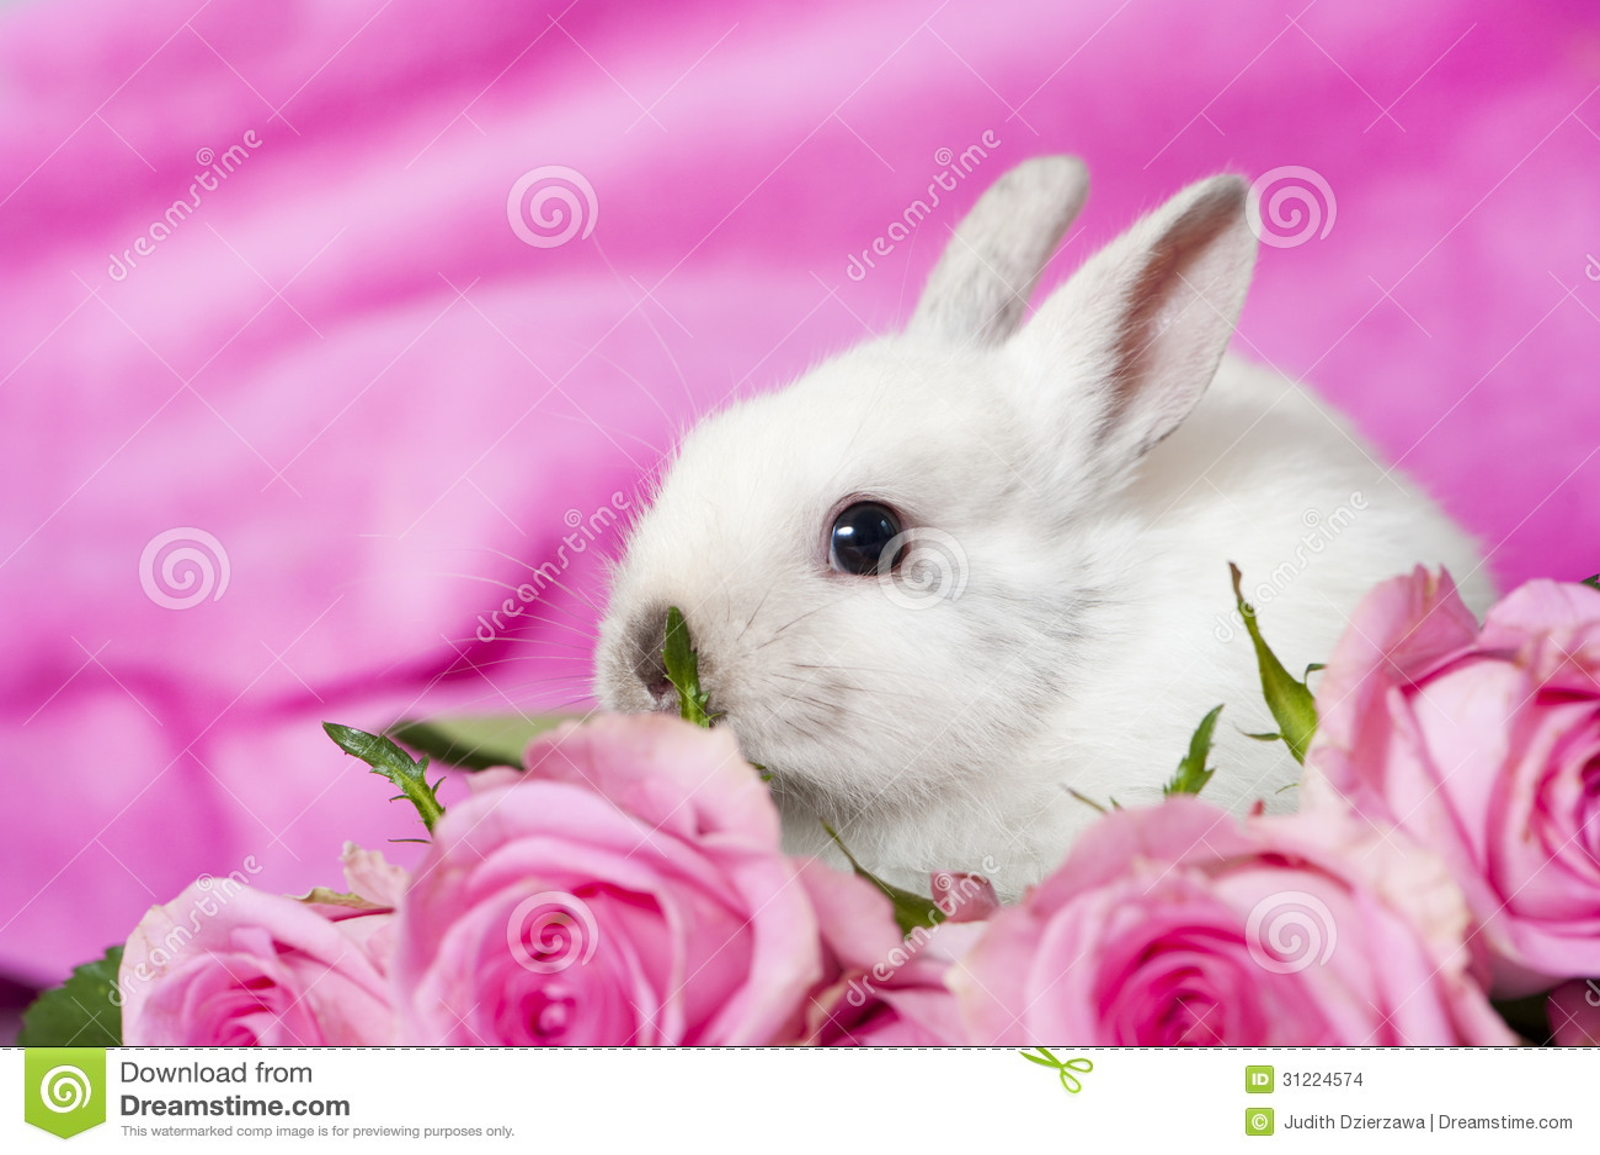 Dwarf Rabbit Stock Images Image 31224574